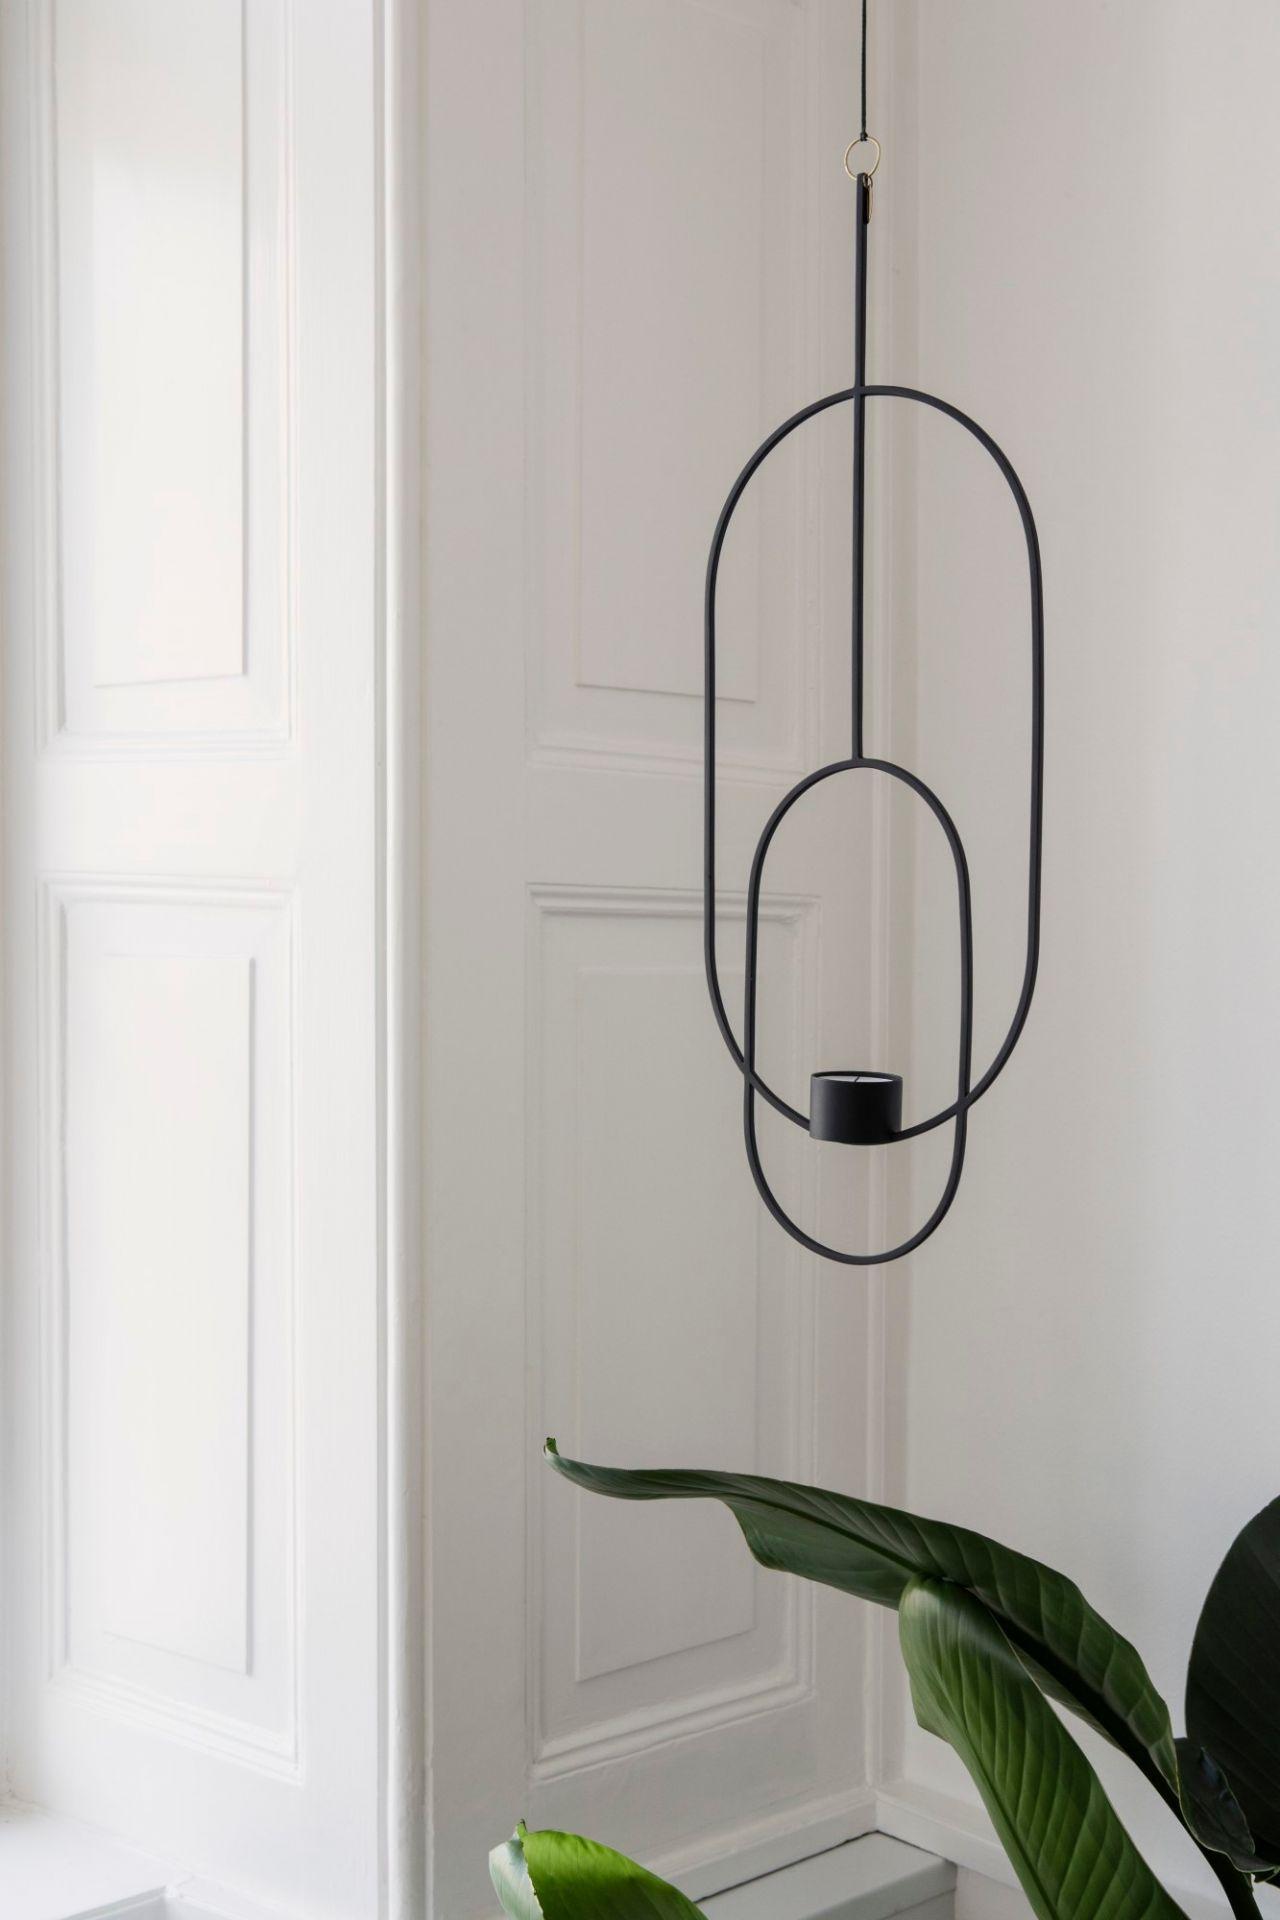 Hanging Tealight Deco oval Ferm Living